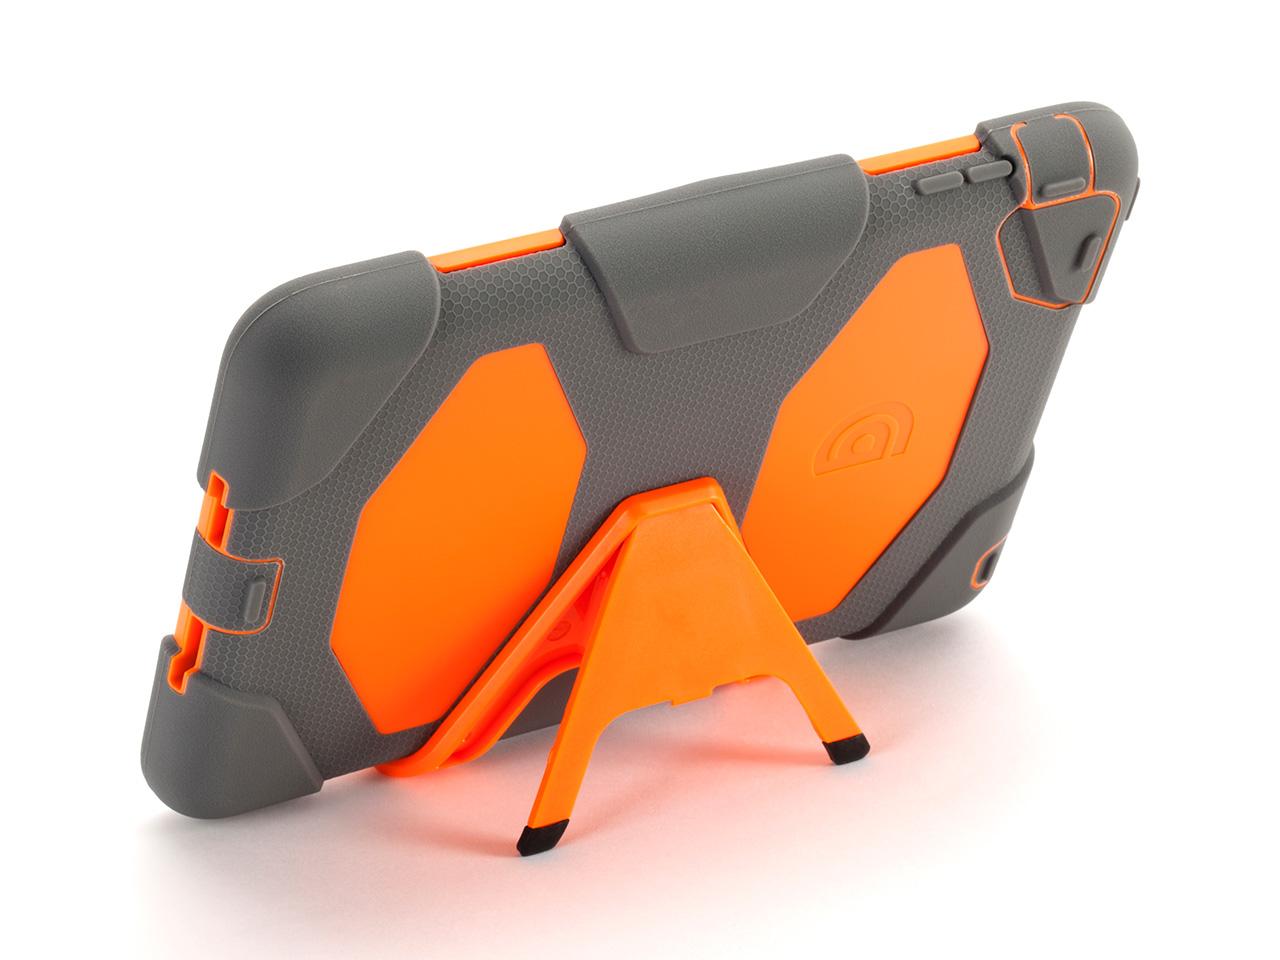 Grey/Orange Survivor All-Terrain Case for iPad mini